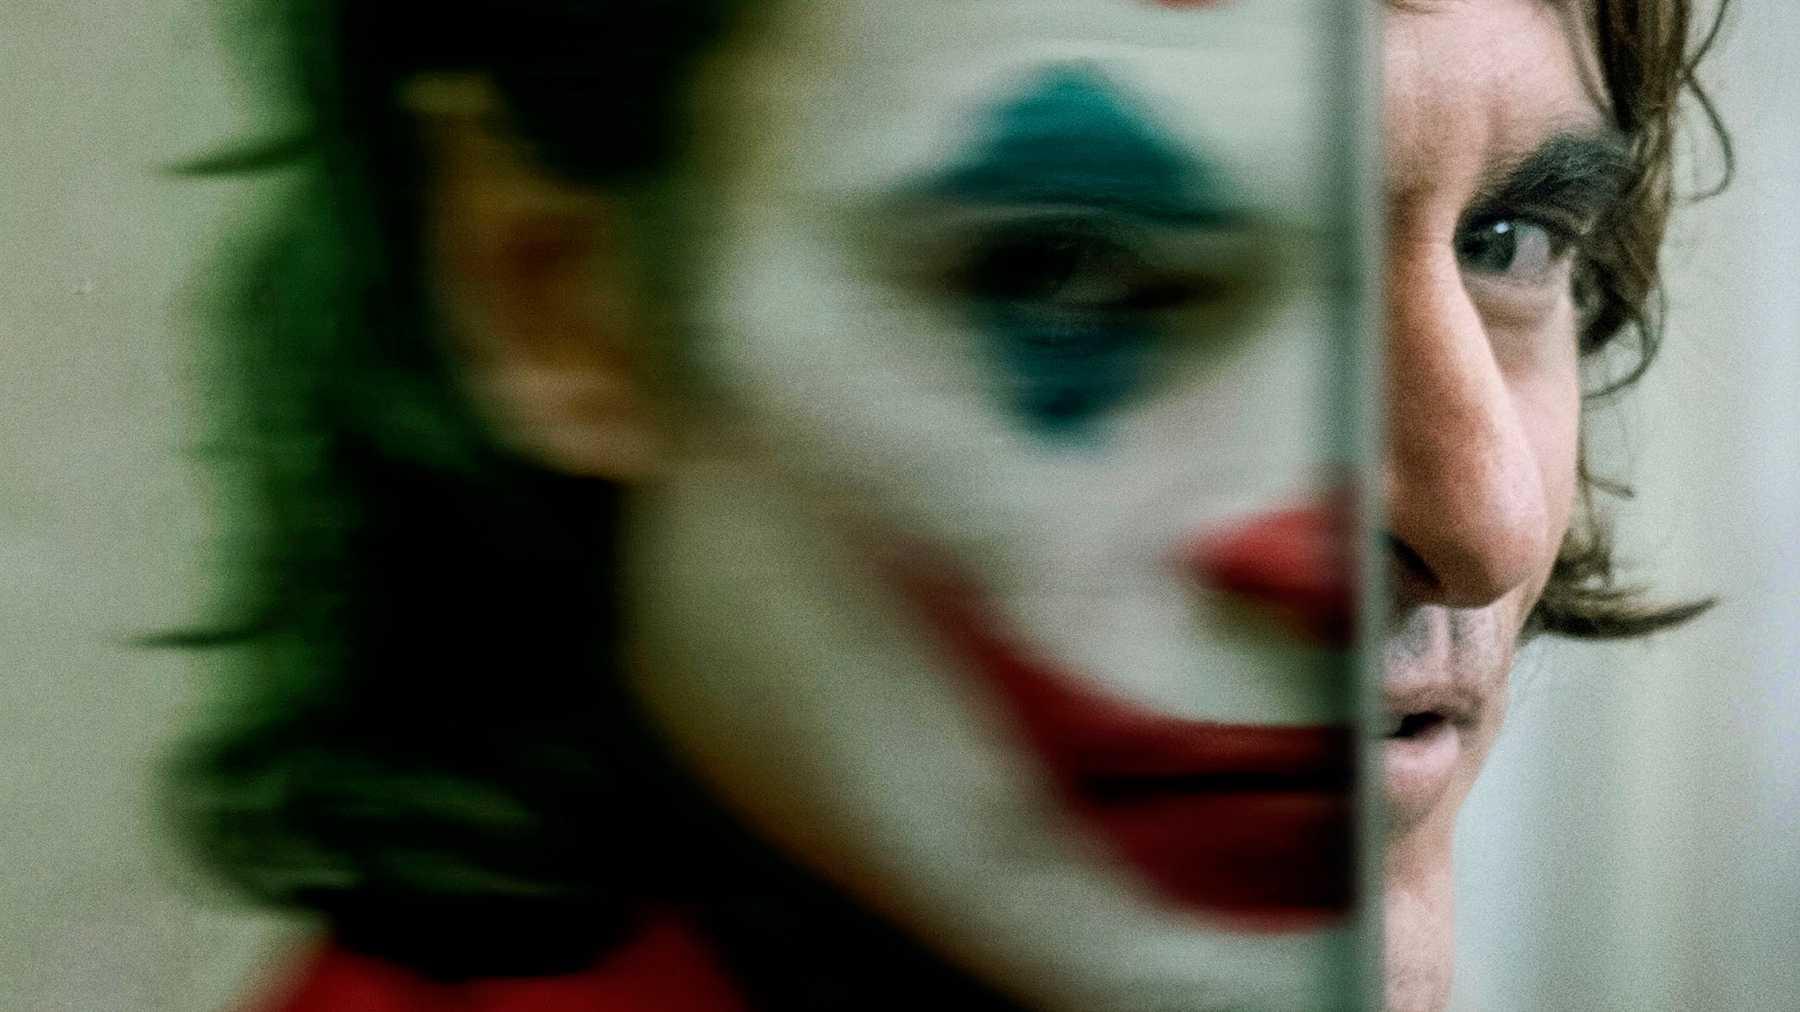 Joker Ringtone Download Sad Lai Lai Mood Off Theme Laugh